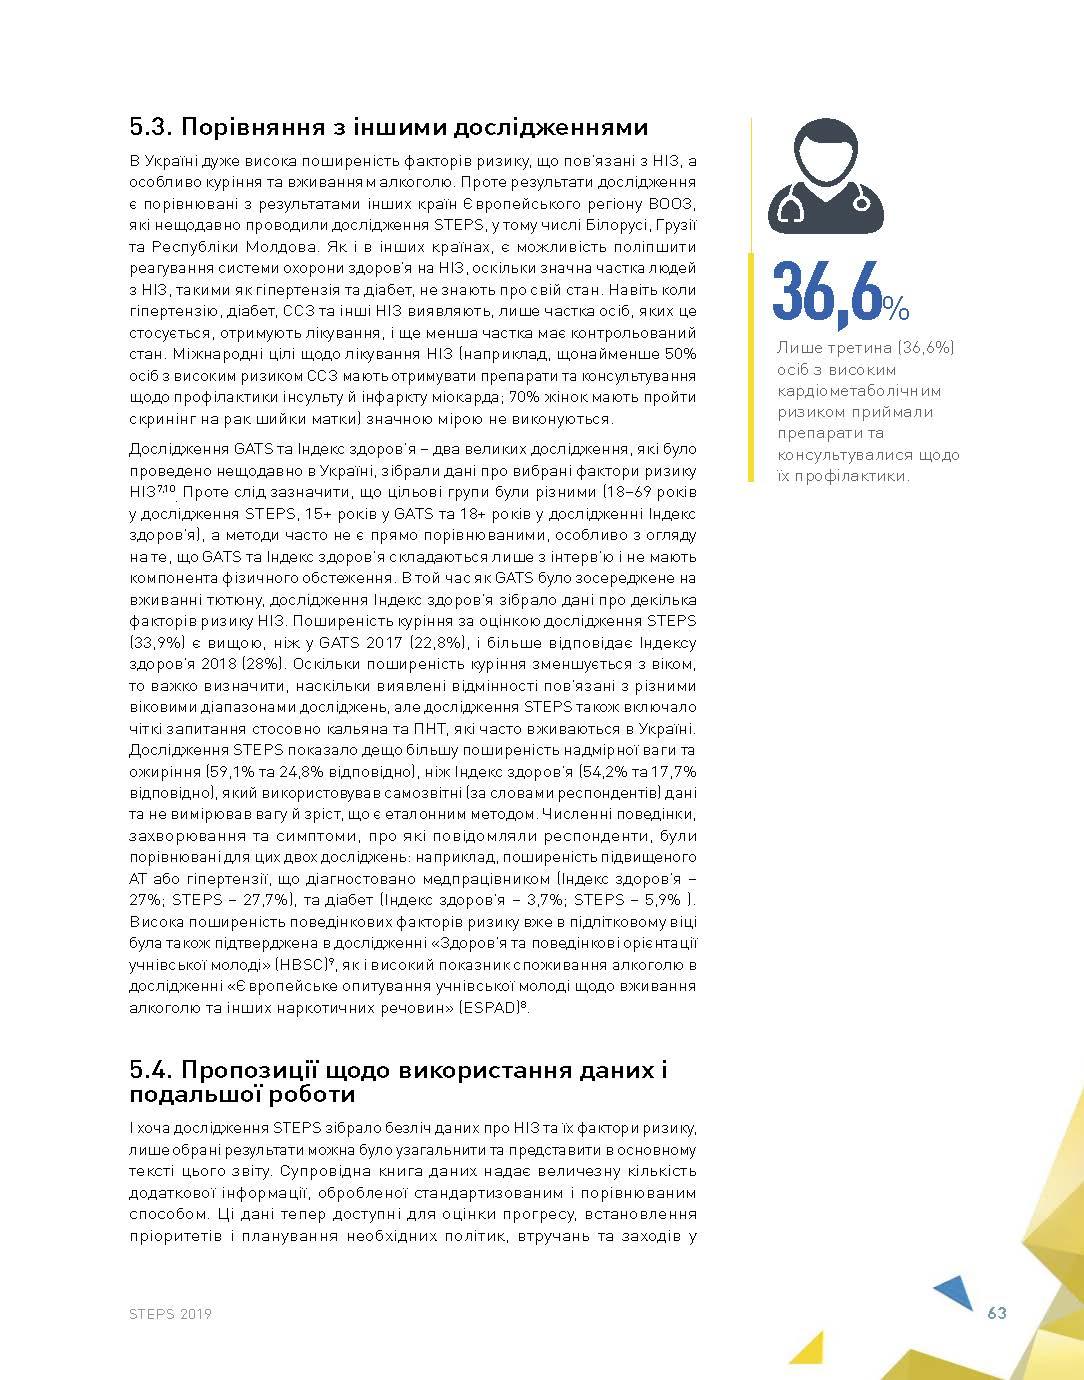 STEPS_Report_ukr_Страница_83